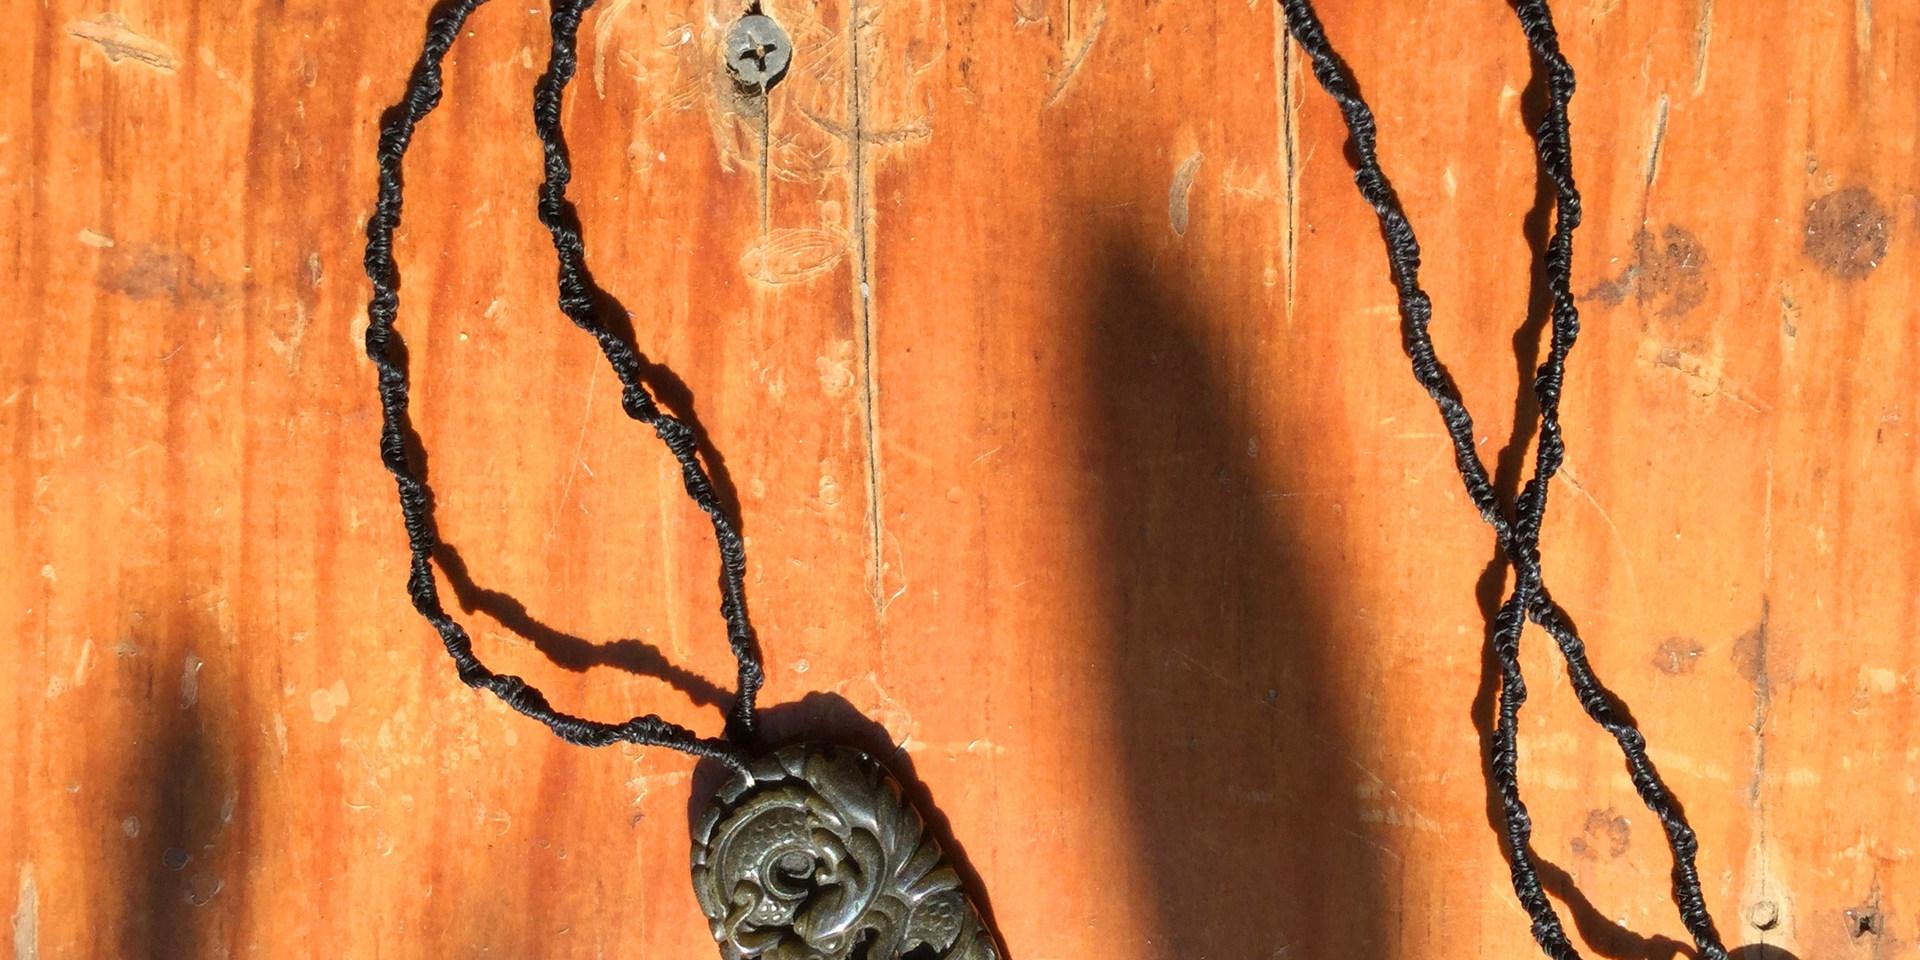 dragon pierre obsidienne dorée pendentif homme